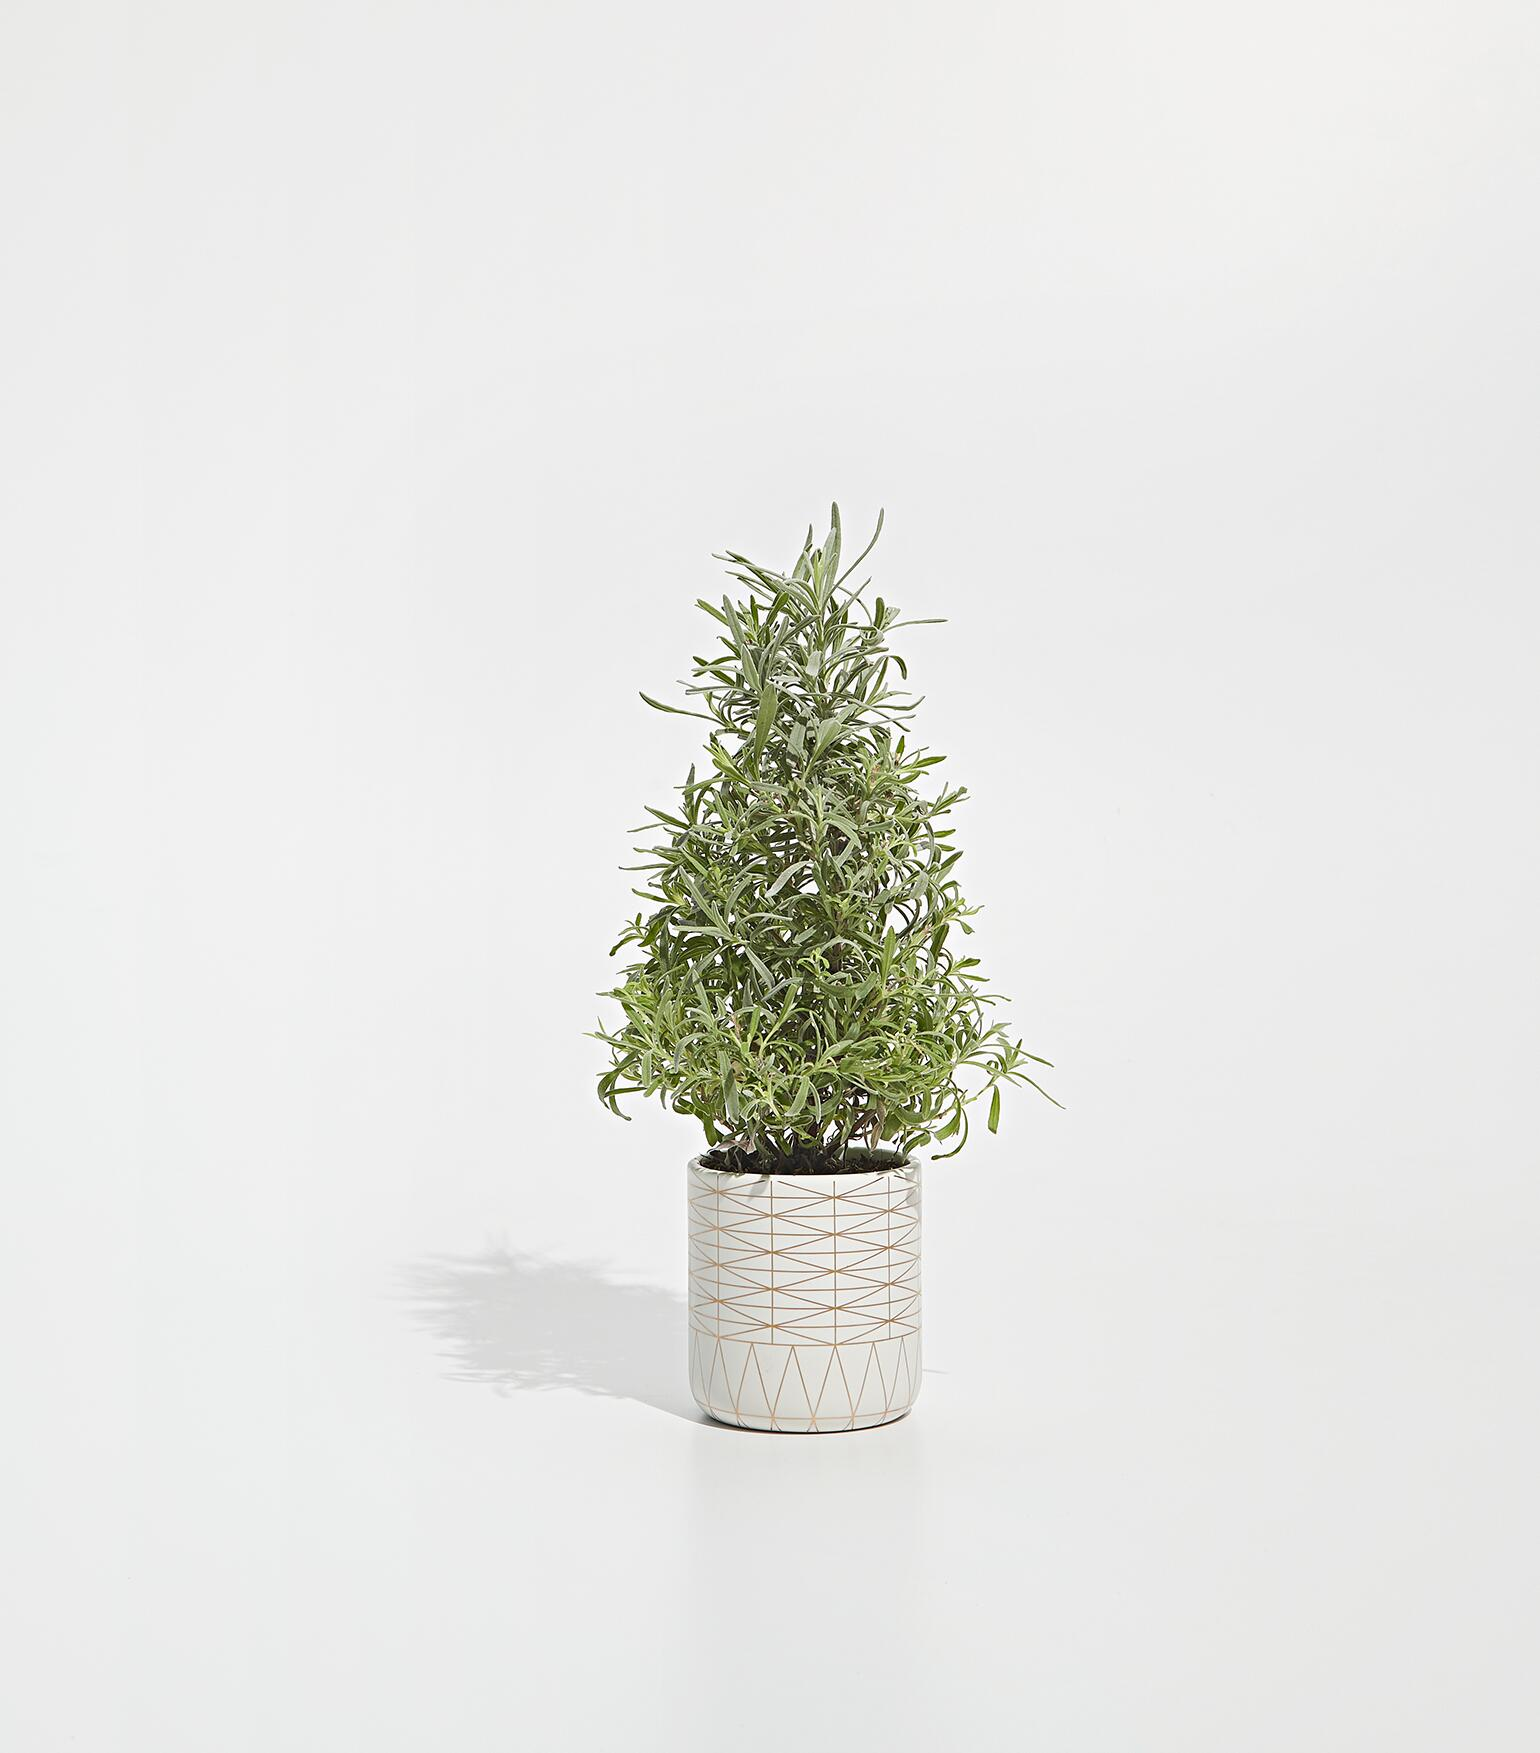 17122_AARP_Plants_&_Books_0375_Lavender.jpg